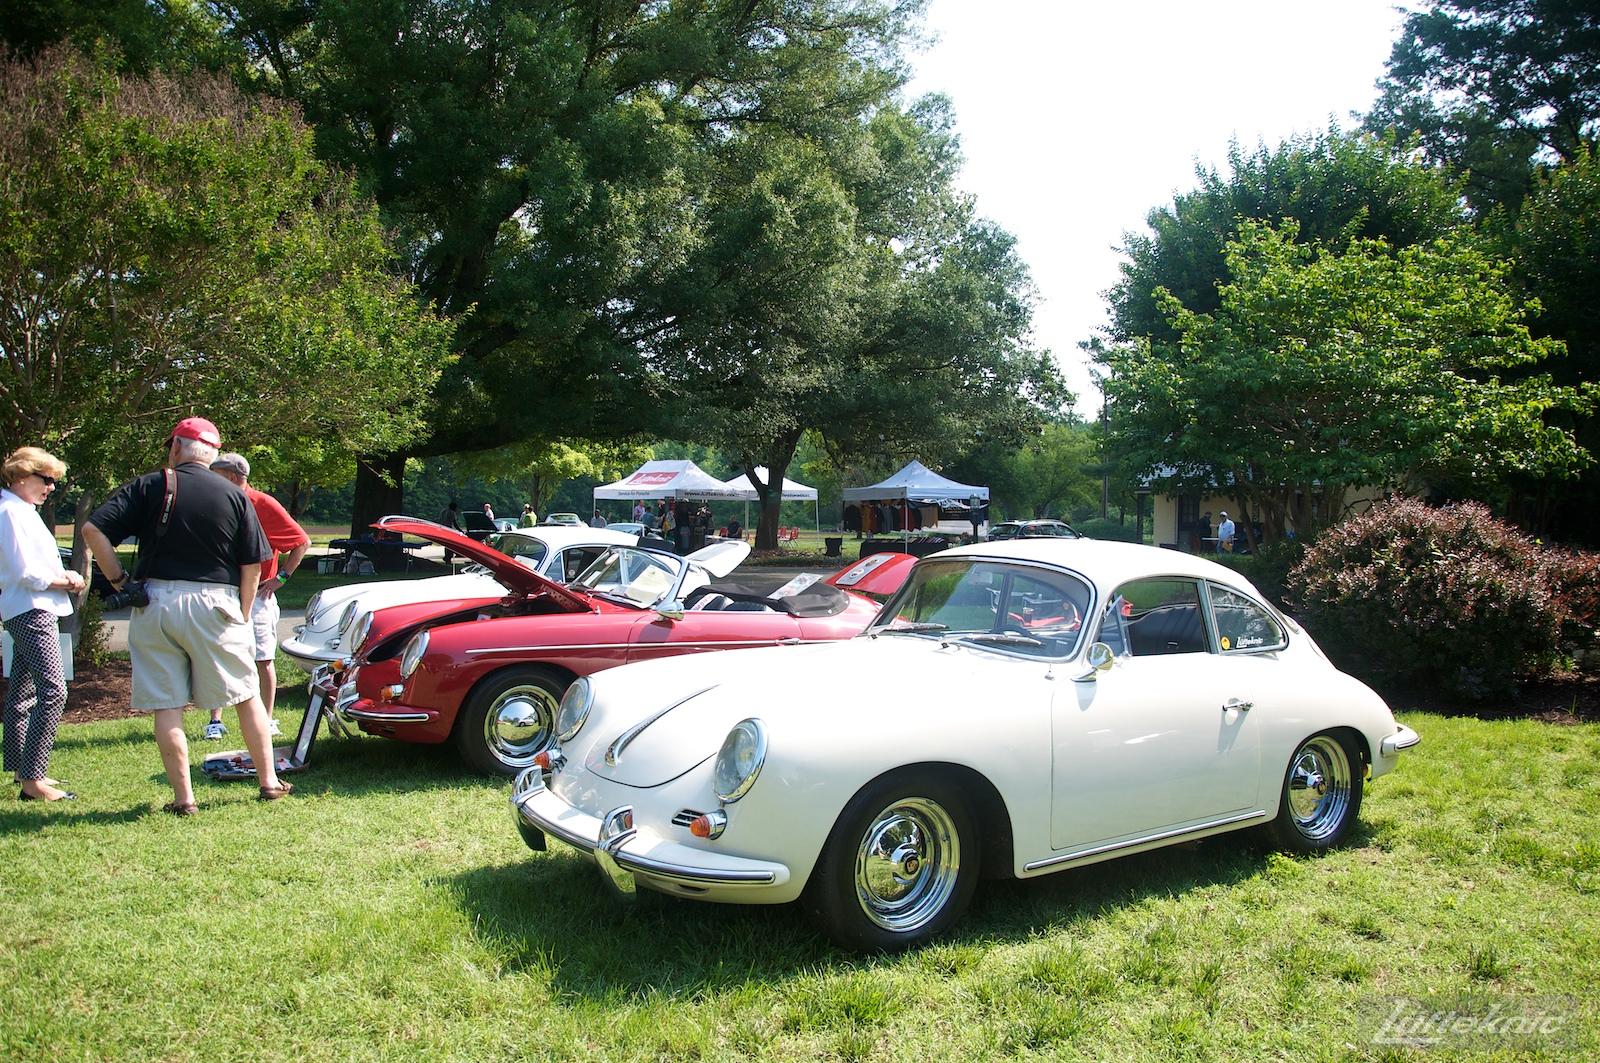 White 356SC at the Richmond Porsche Meet.